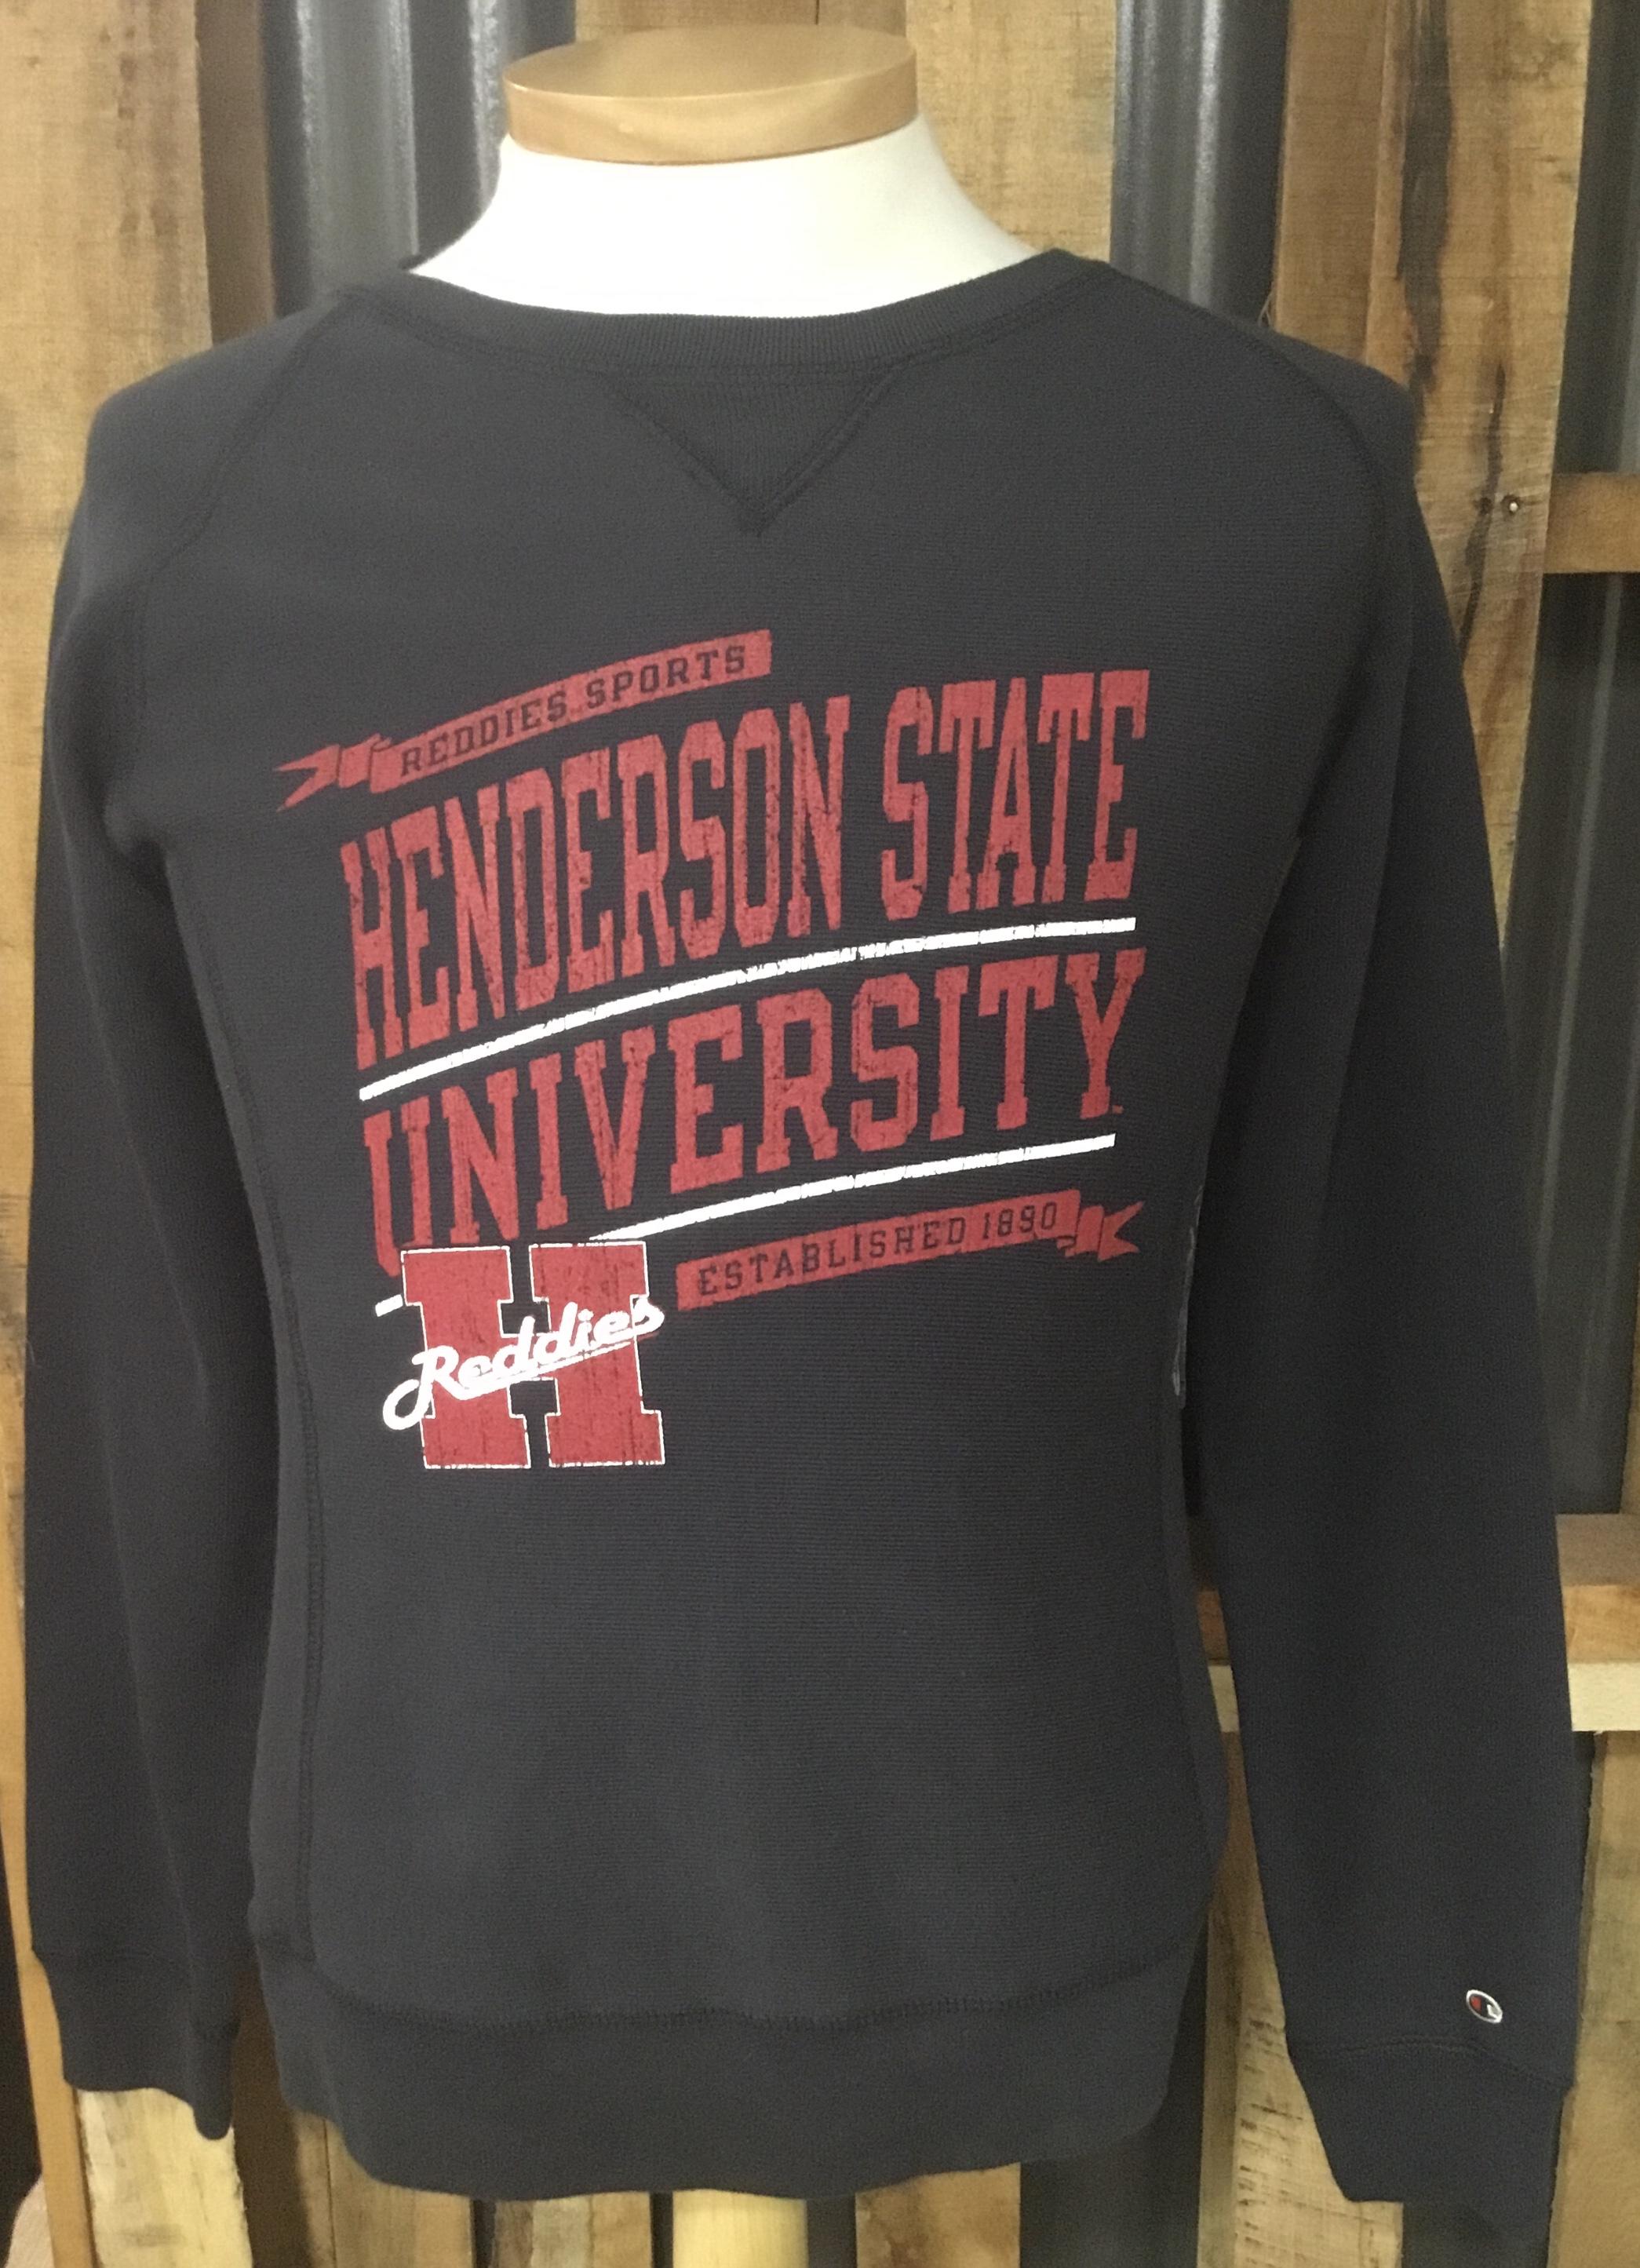 image of: Reddies Sports Henderson State University Crew Sweatshirt